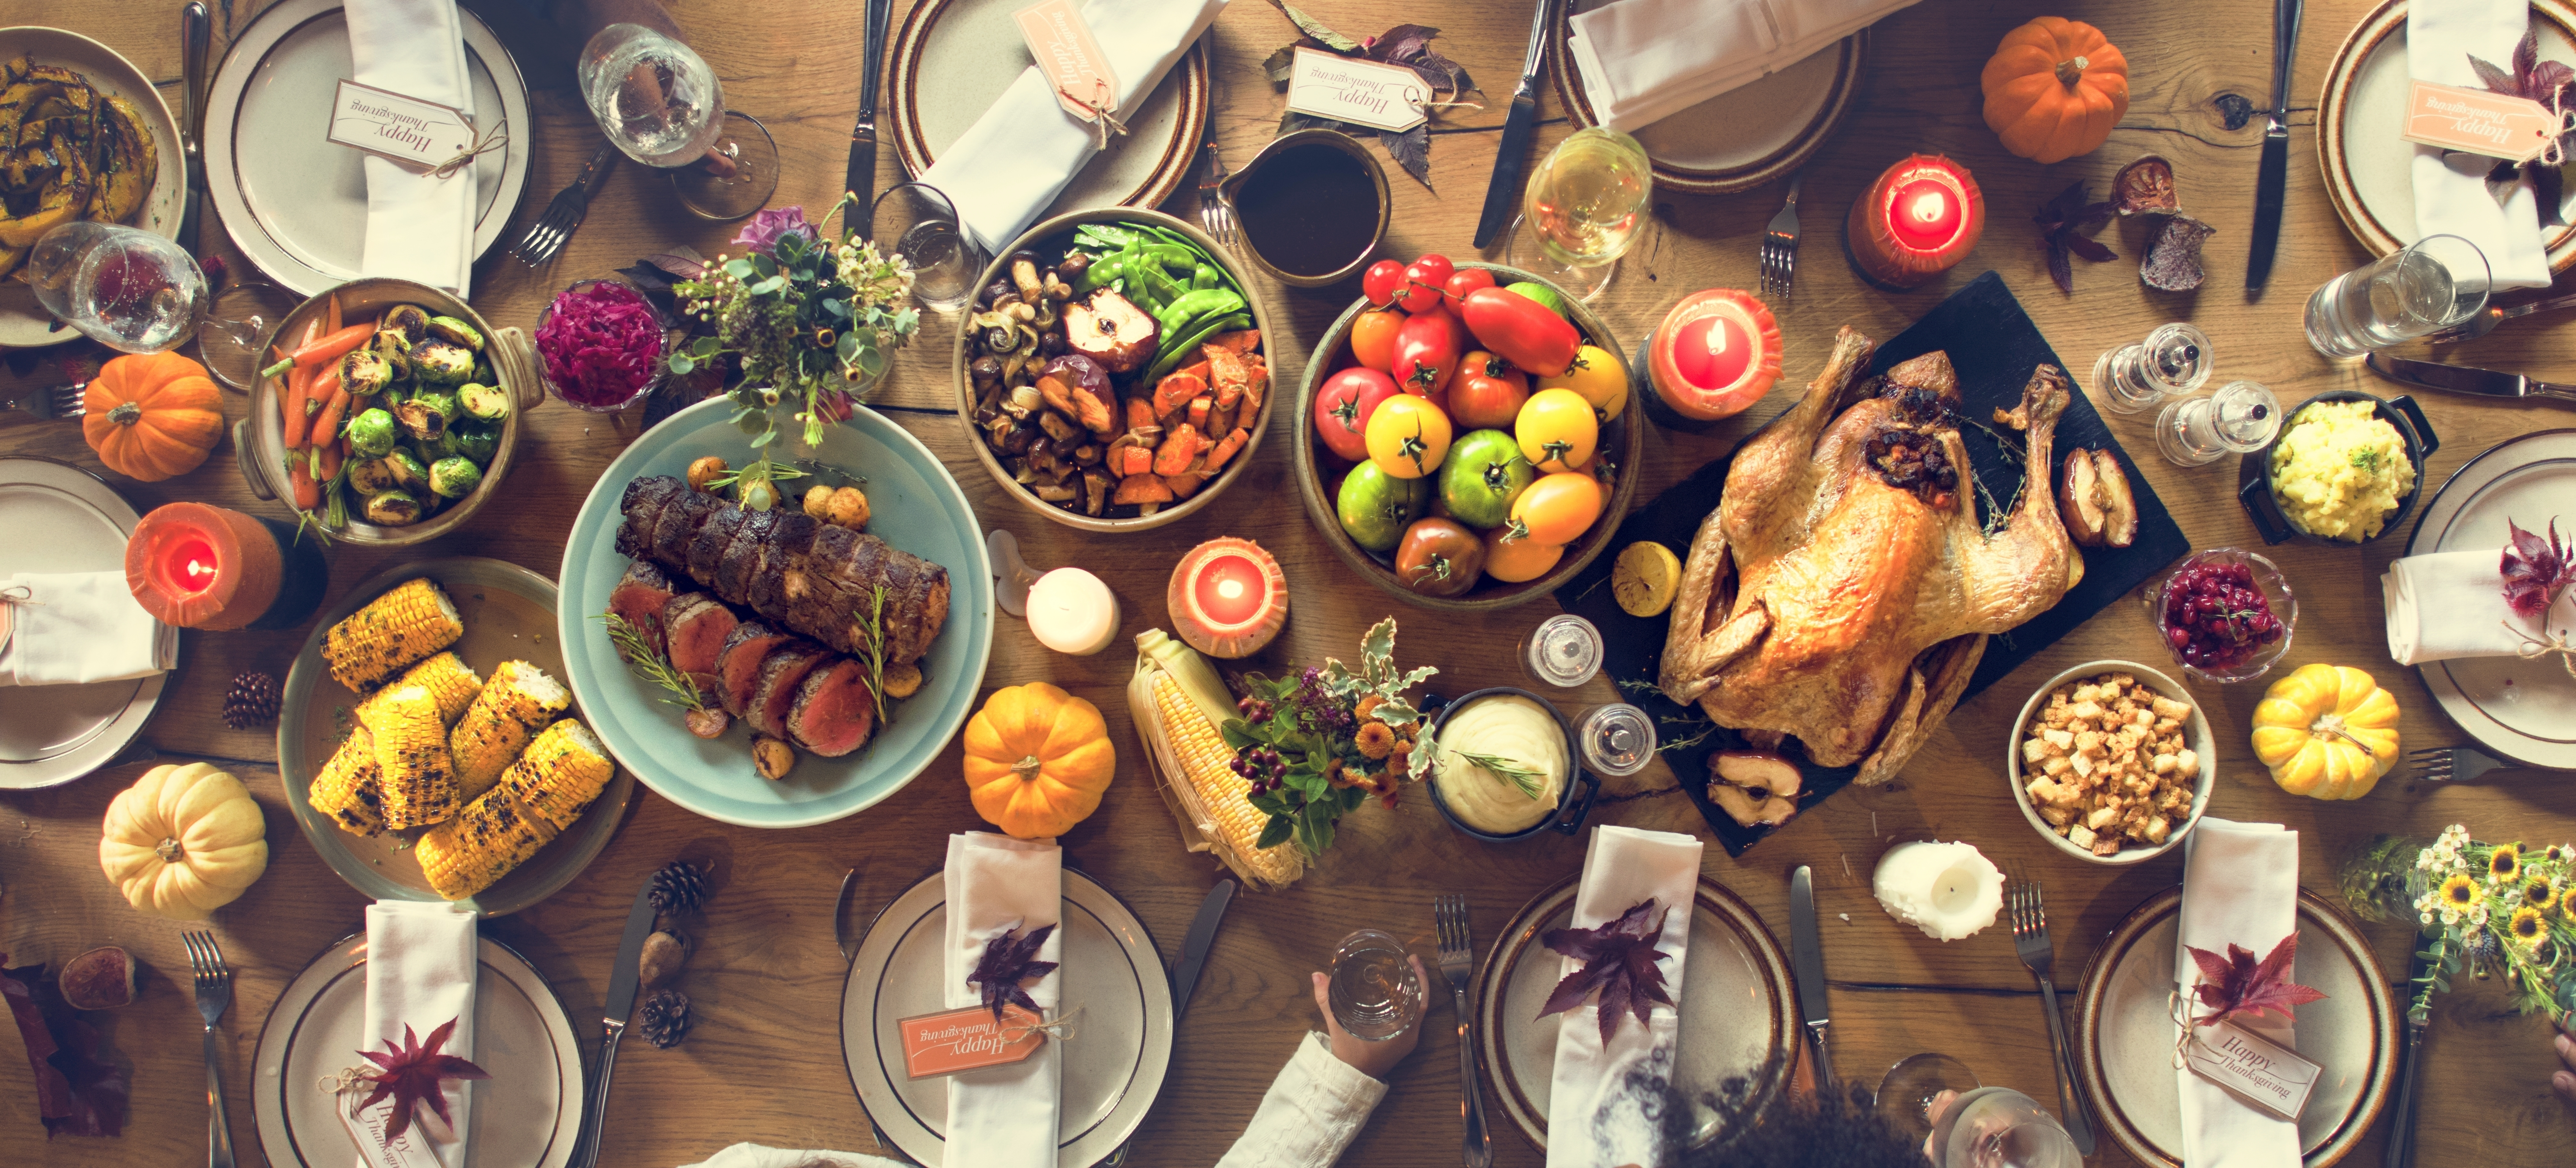 Thanksgiving Celebration - ShutterStock - By Rawpixel.com